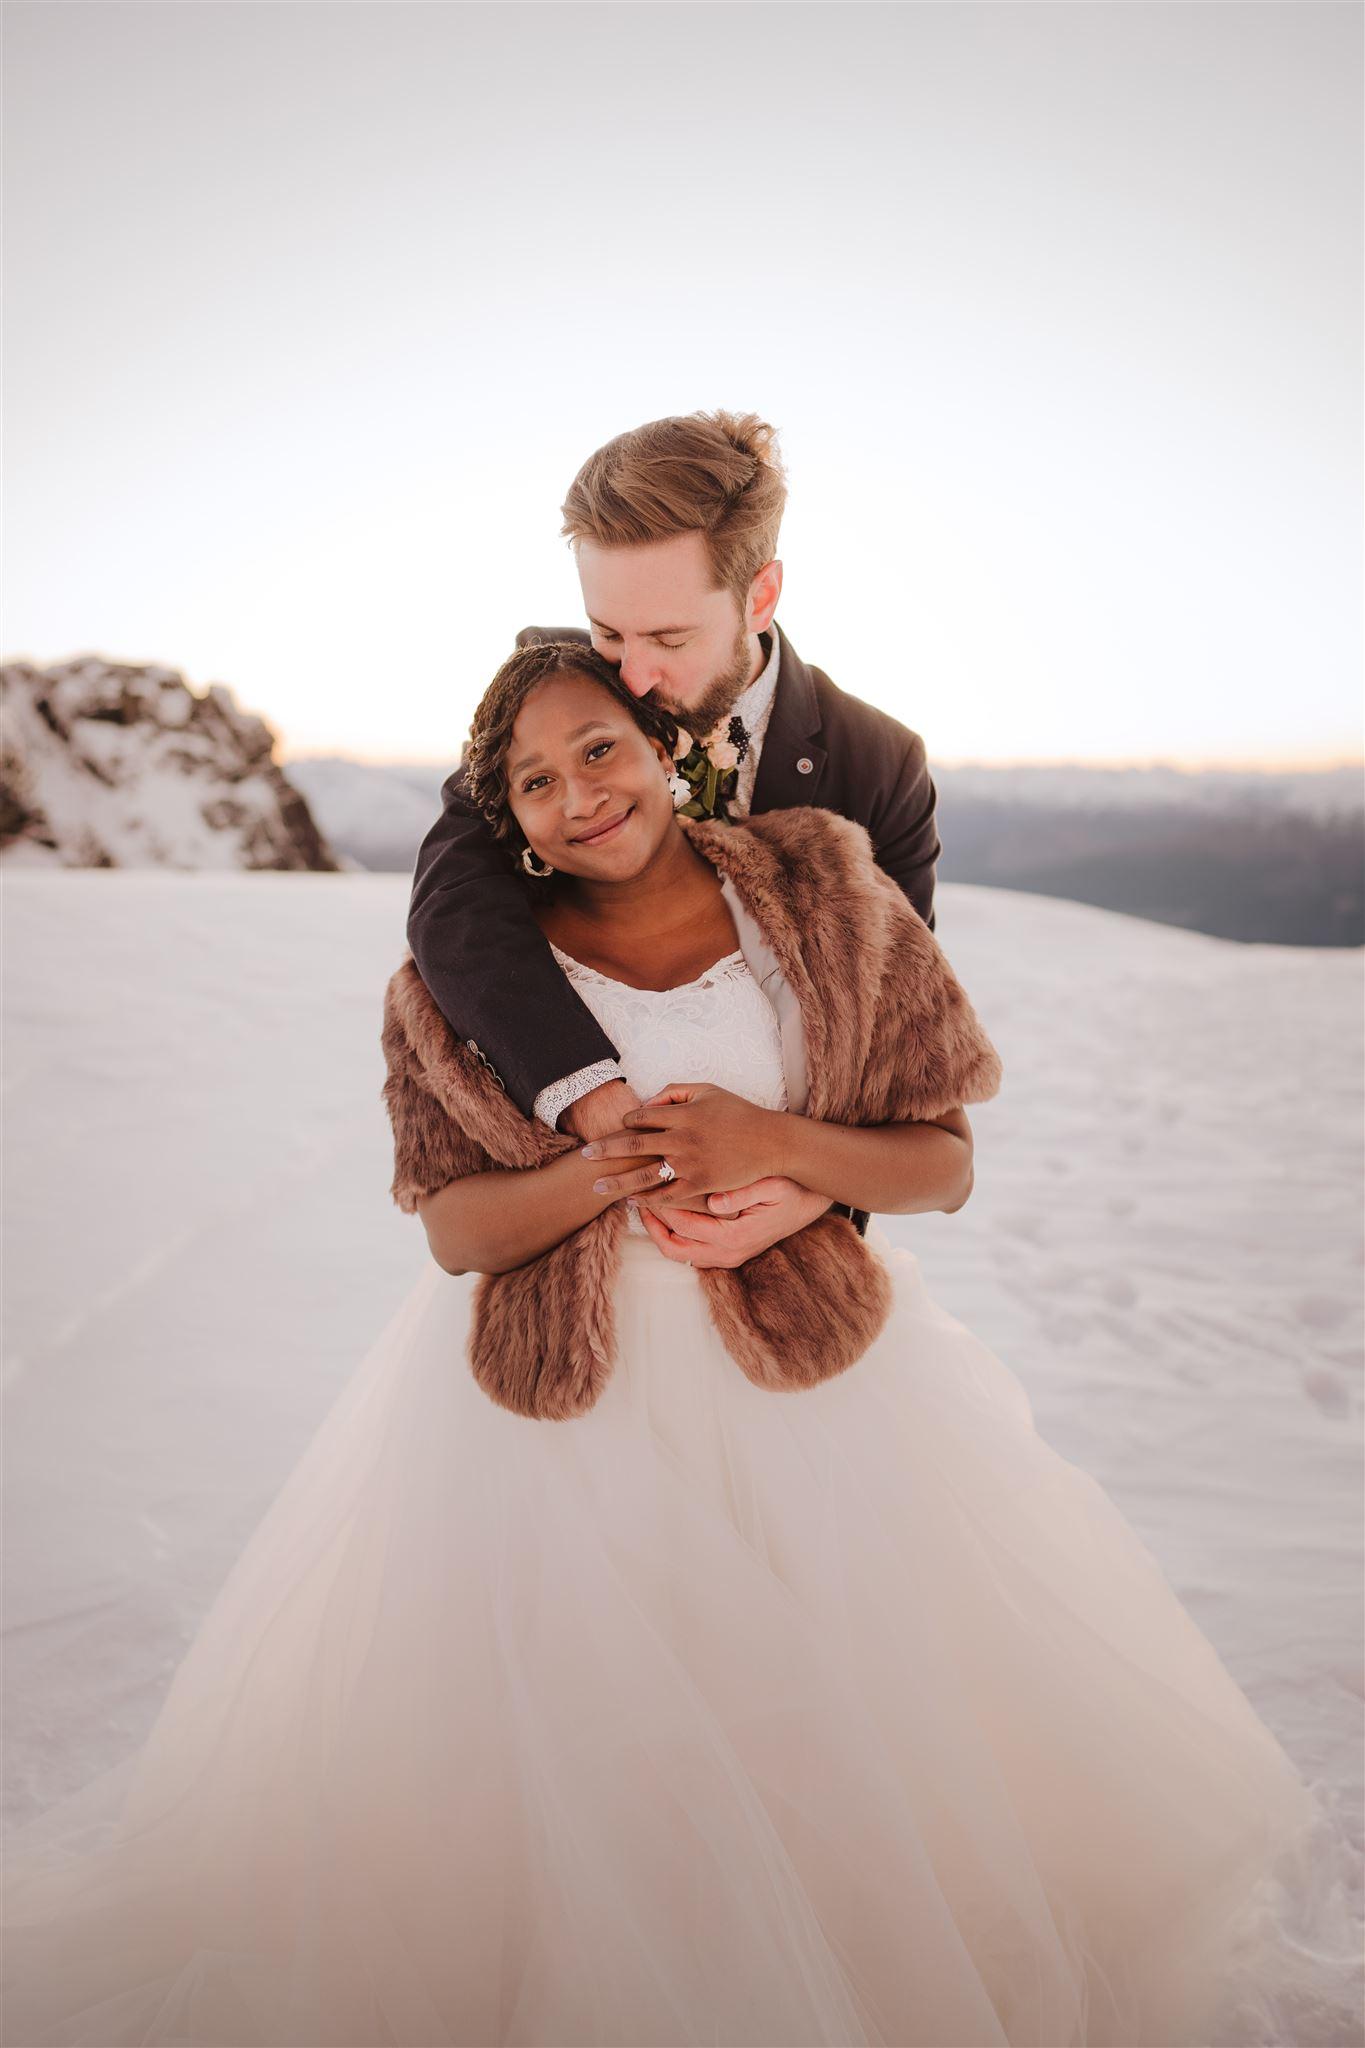 queenstown-wedding-packages-heli-wedding-winter-wedding-sunset-wedding